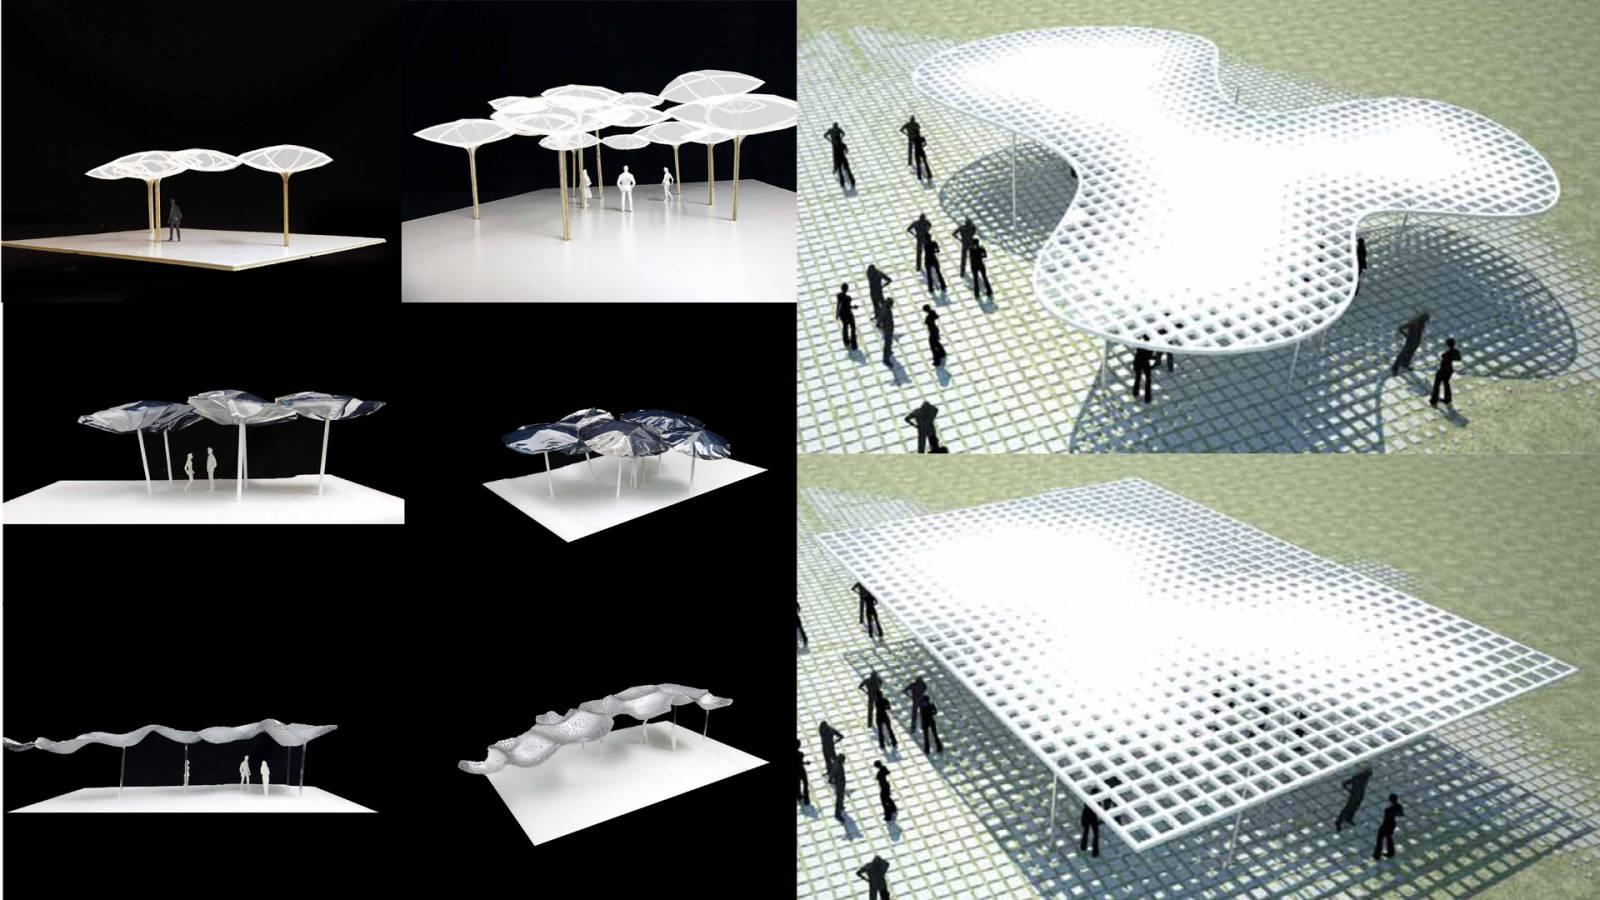 CANOPY STUDIES - São Paulo Art Pavillion - SPOL Architects